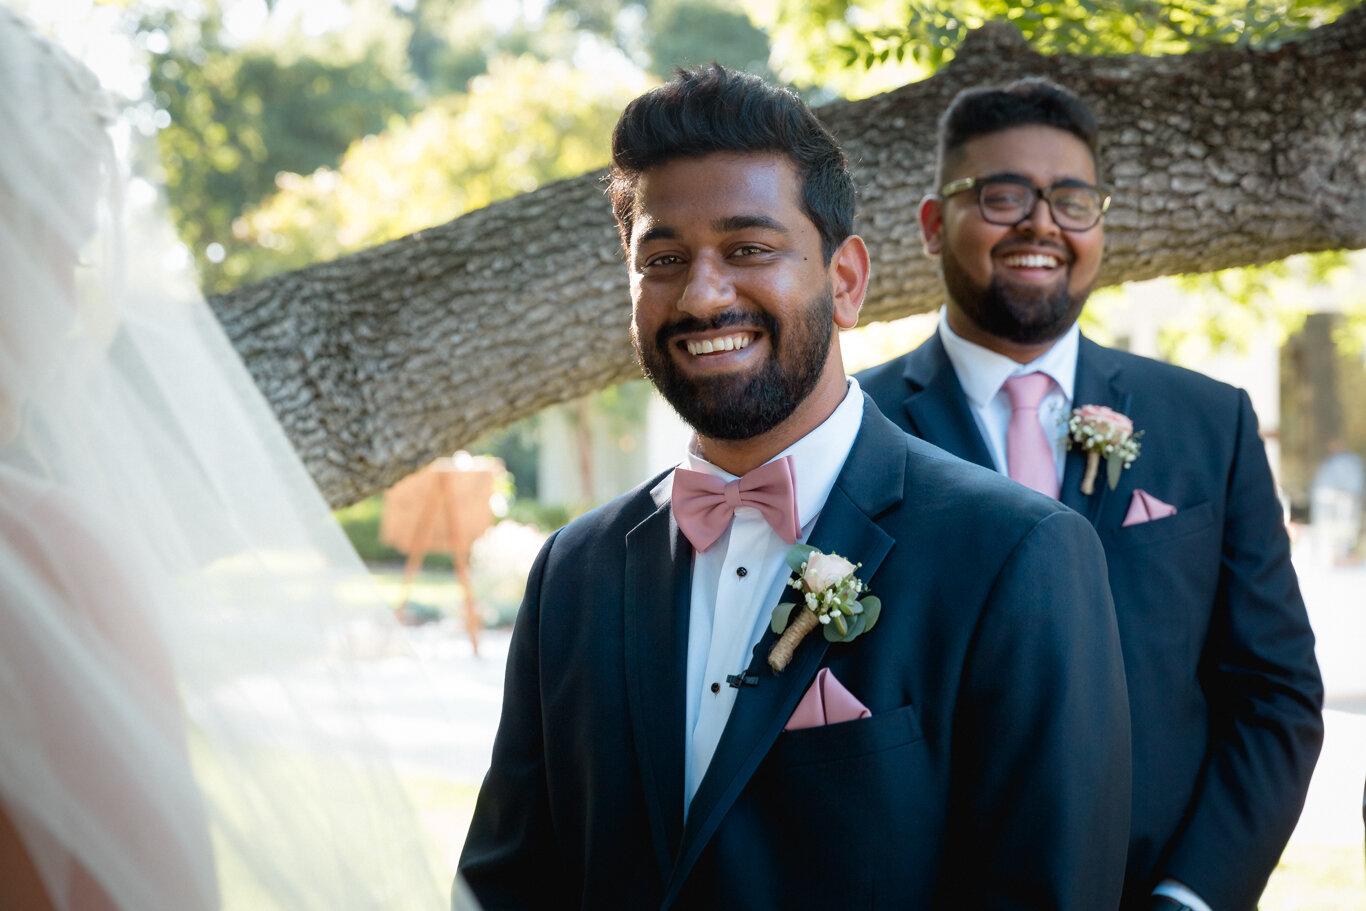 2019.08.24_Emily-Ashir-Wedding-at-the-Maples-5882.jpg